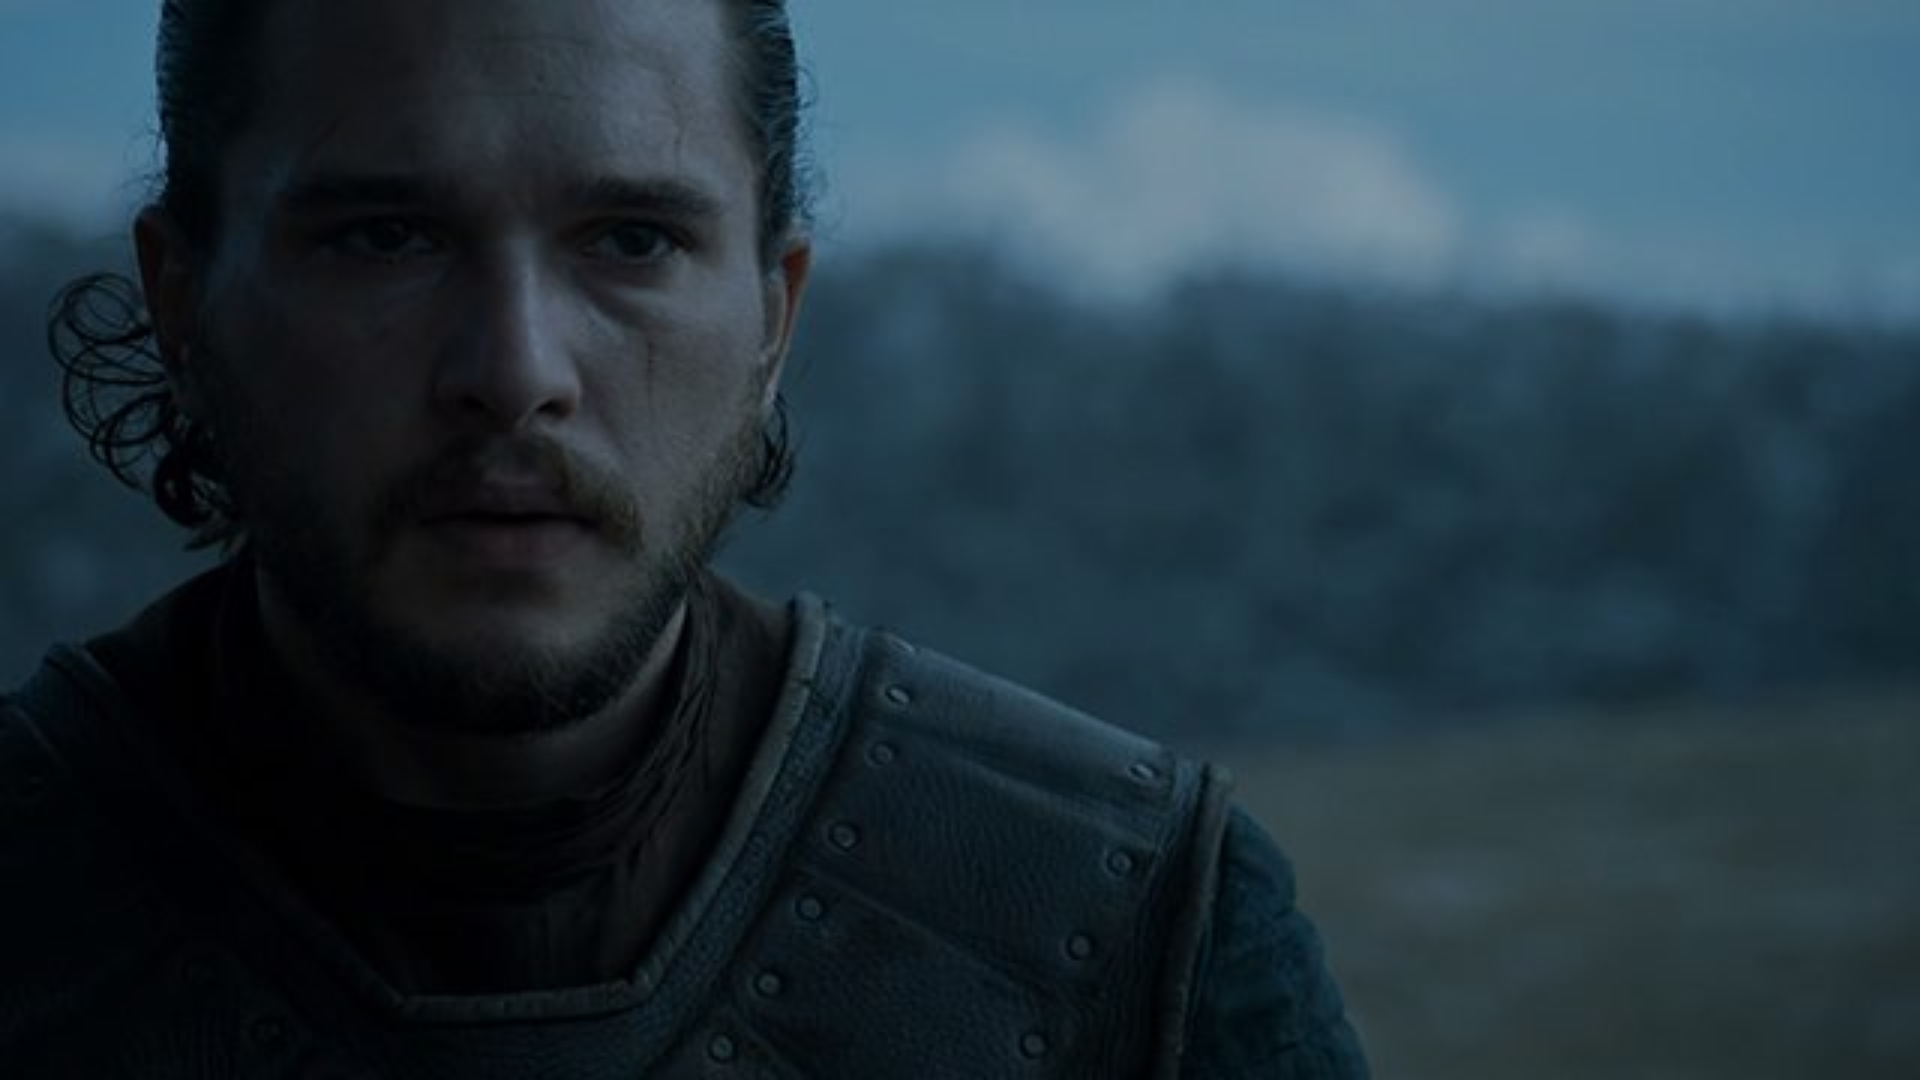 Game-of-Thrones-Kit-Harrington